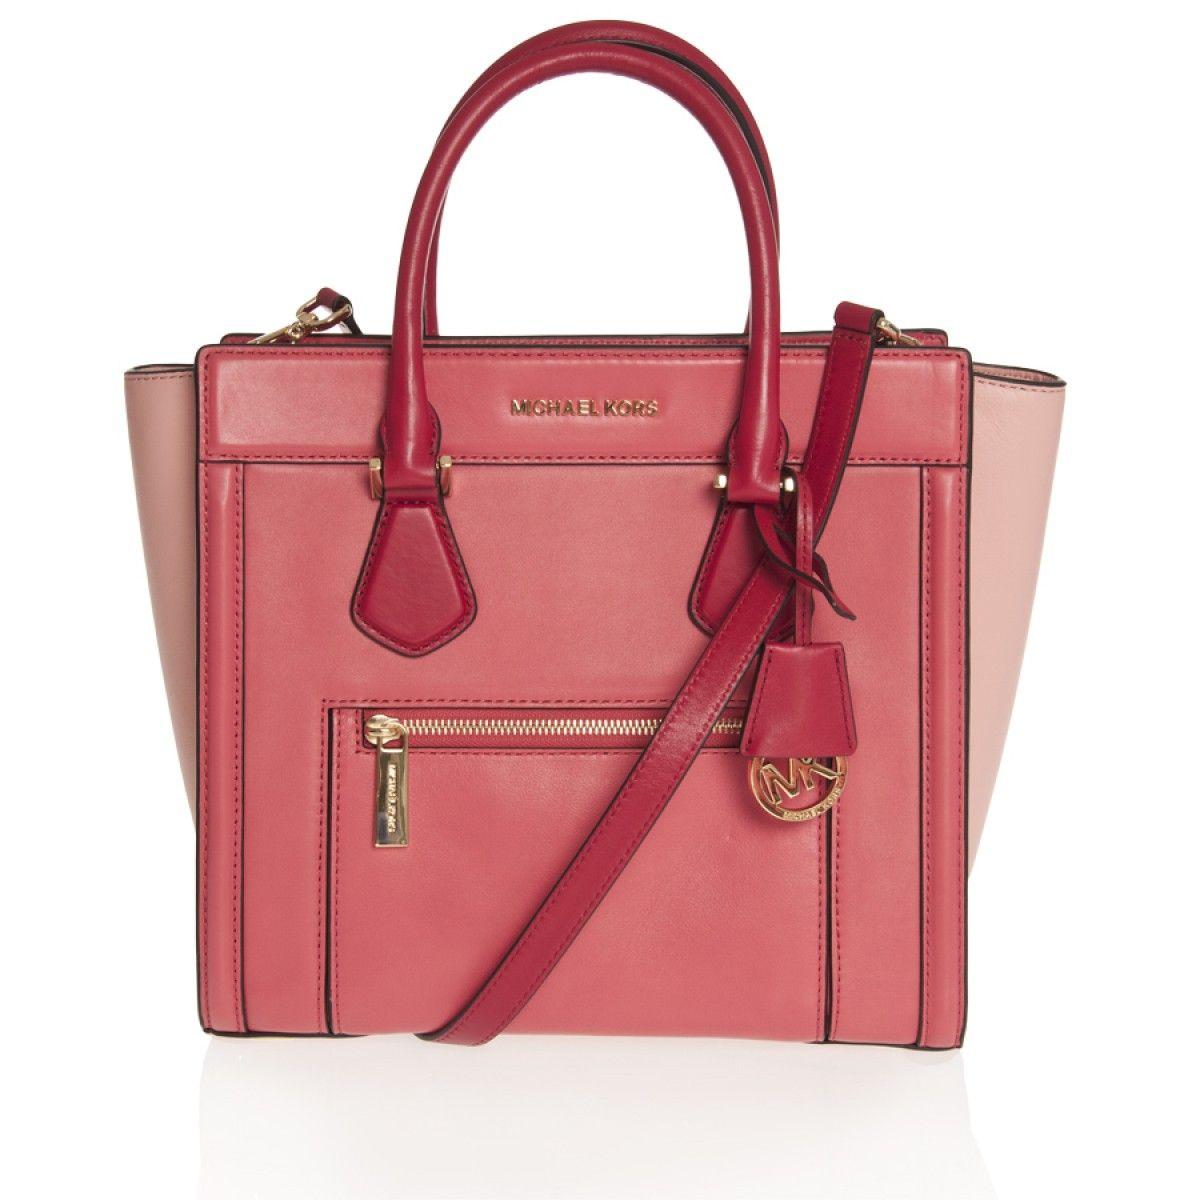 6026f186a4e7f Grüner Online Shop  Michael Kors Tasche COLETTE in Wassermelone Pink